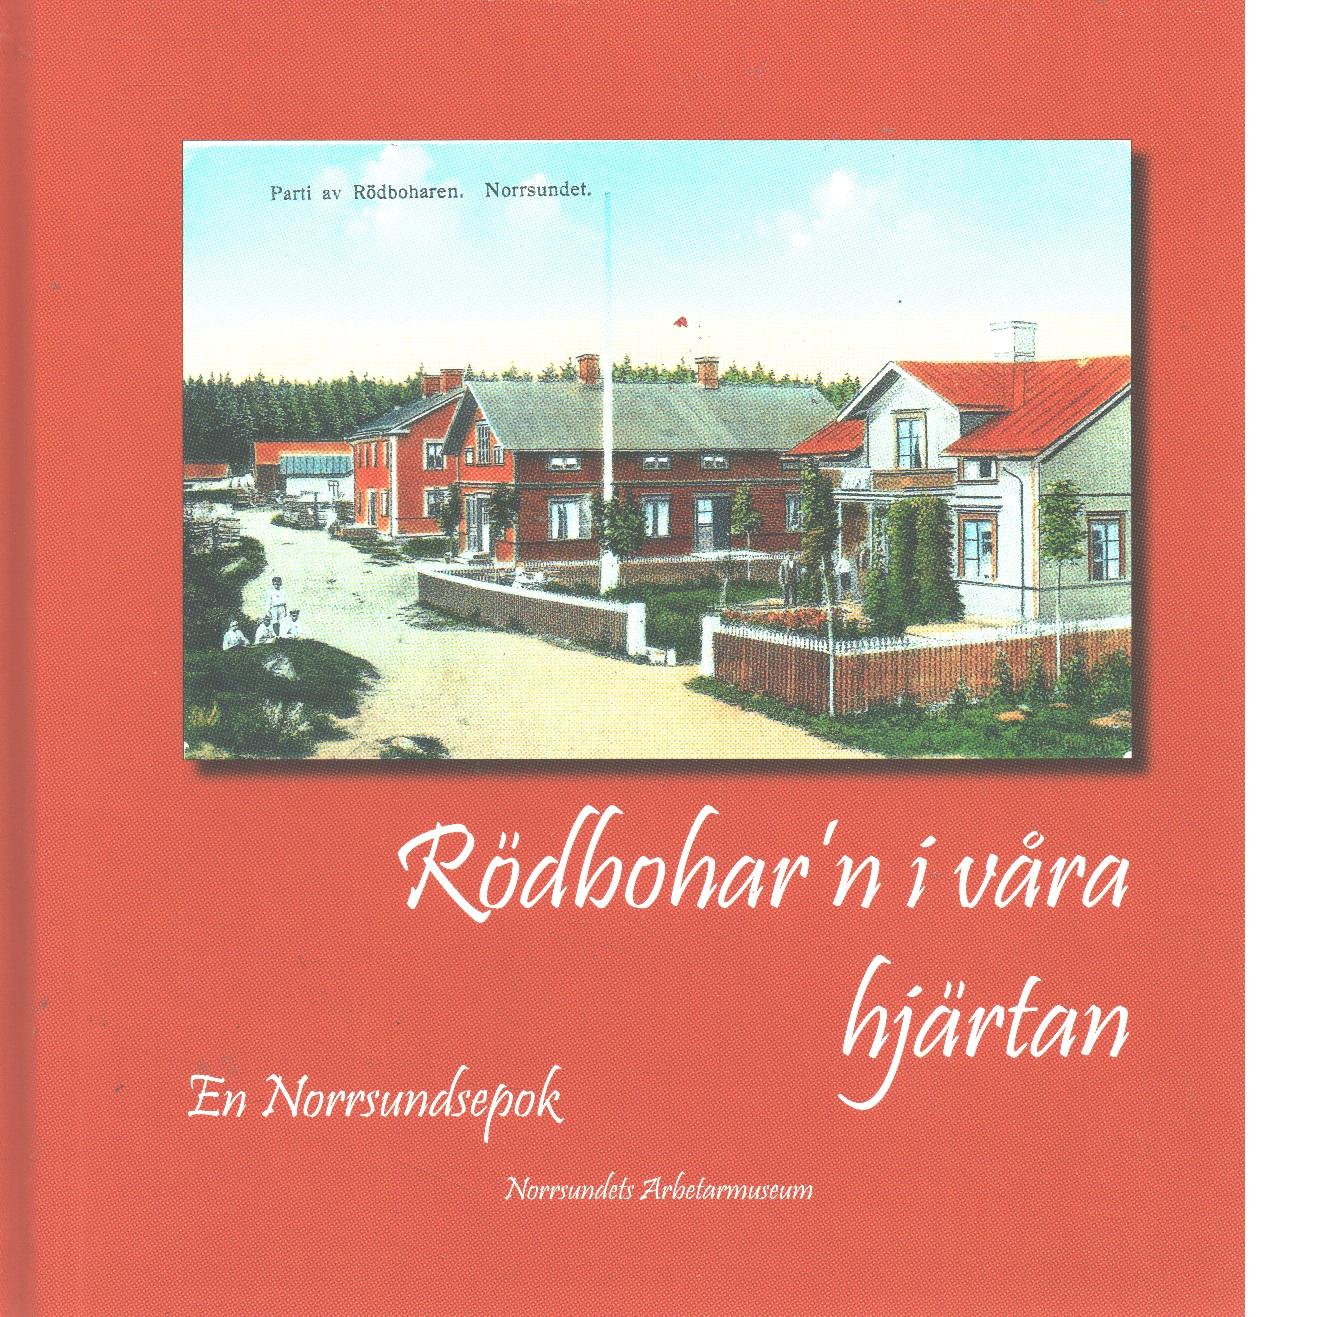 Rödbohar´n i våra hjärtan : en Norrsundsepok - Red. Norrsundets arbetarmuseum